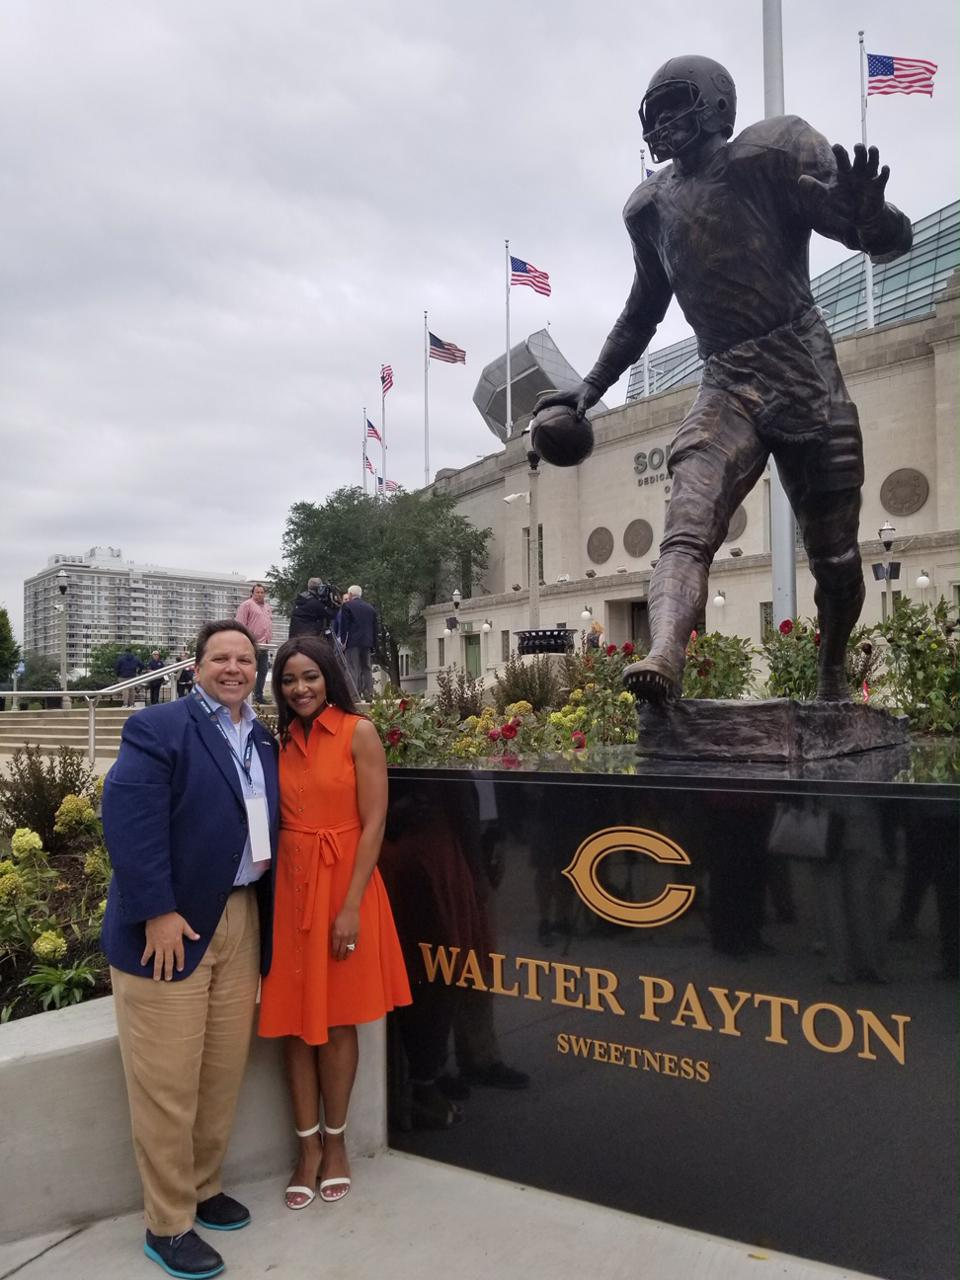 Don Yaeger with Brittney Payton, daughter of Walter Payton.